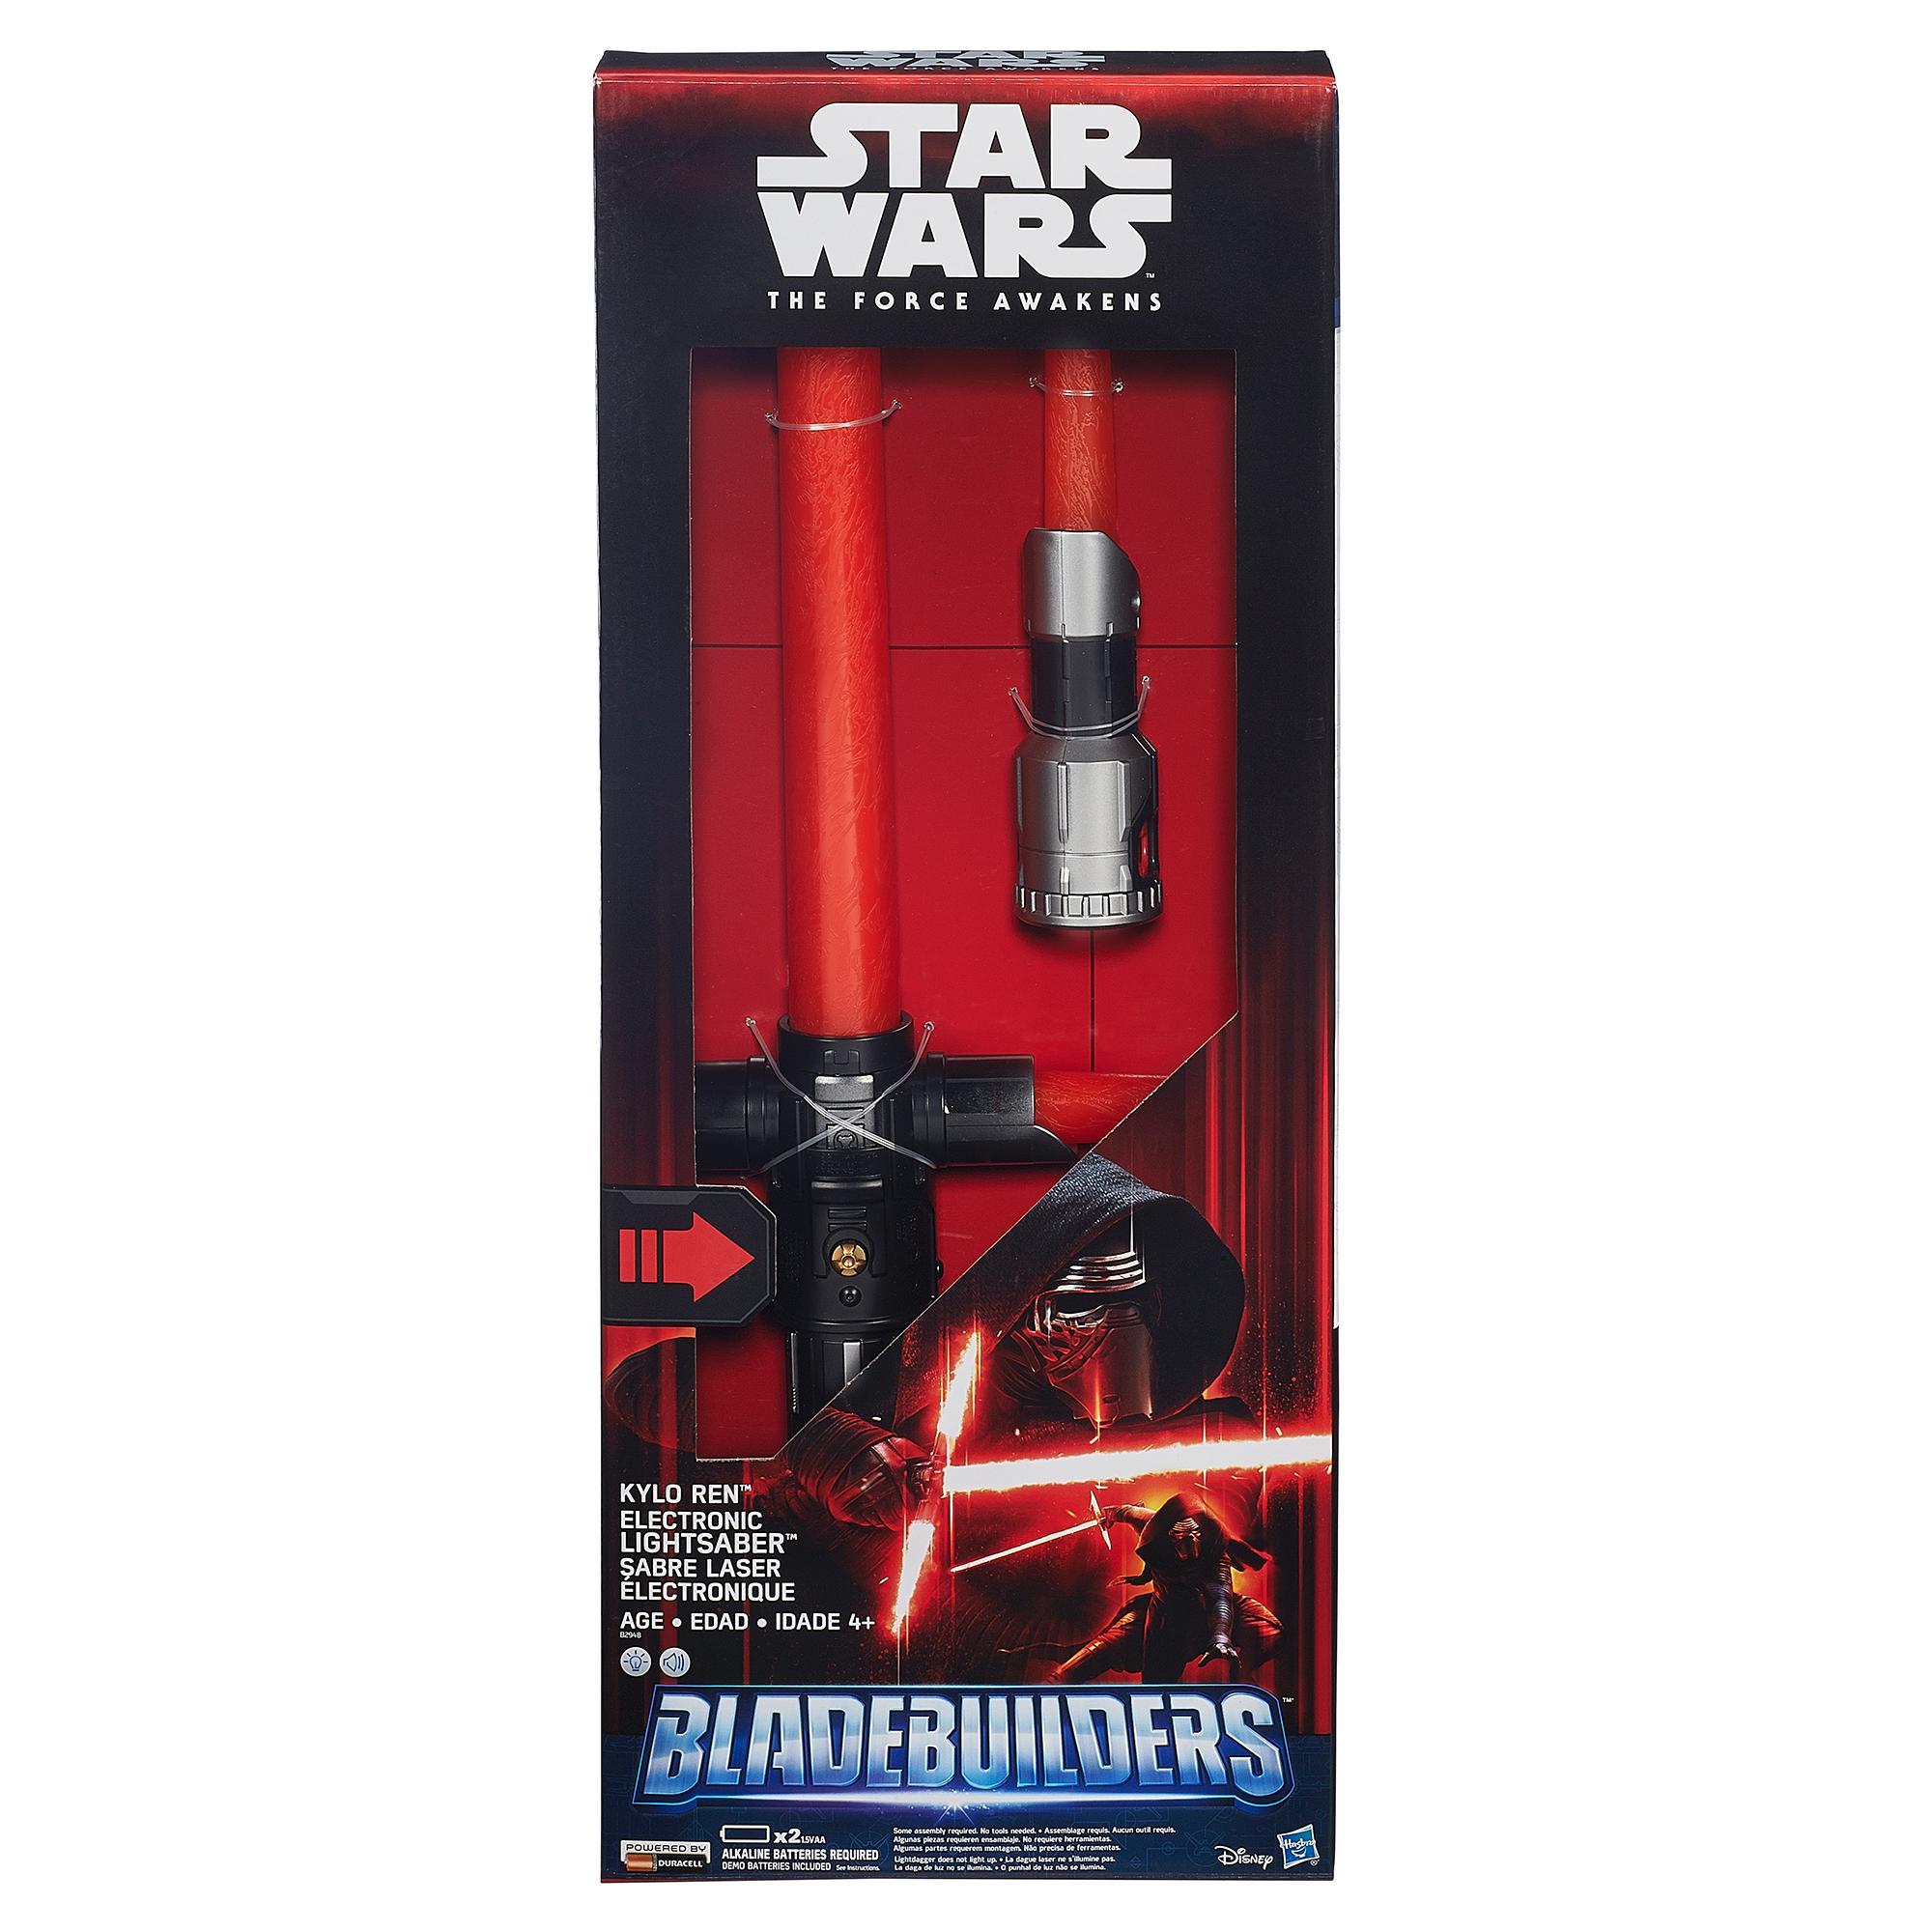 Star-Wars-The-Force-Awakens-Kylo-Ren-Deluxe-Electronic-Lightsaber thumbnail 2